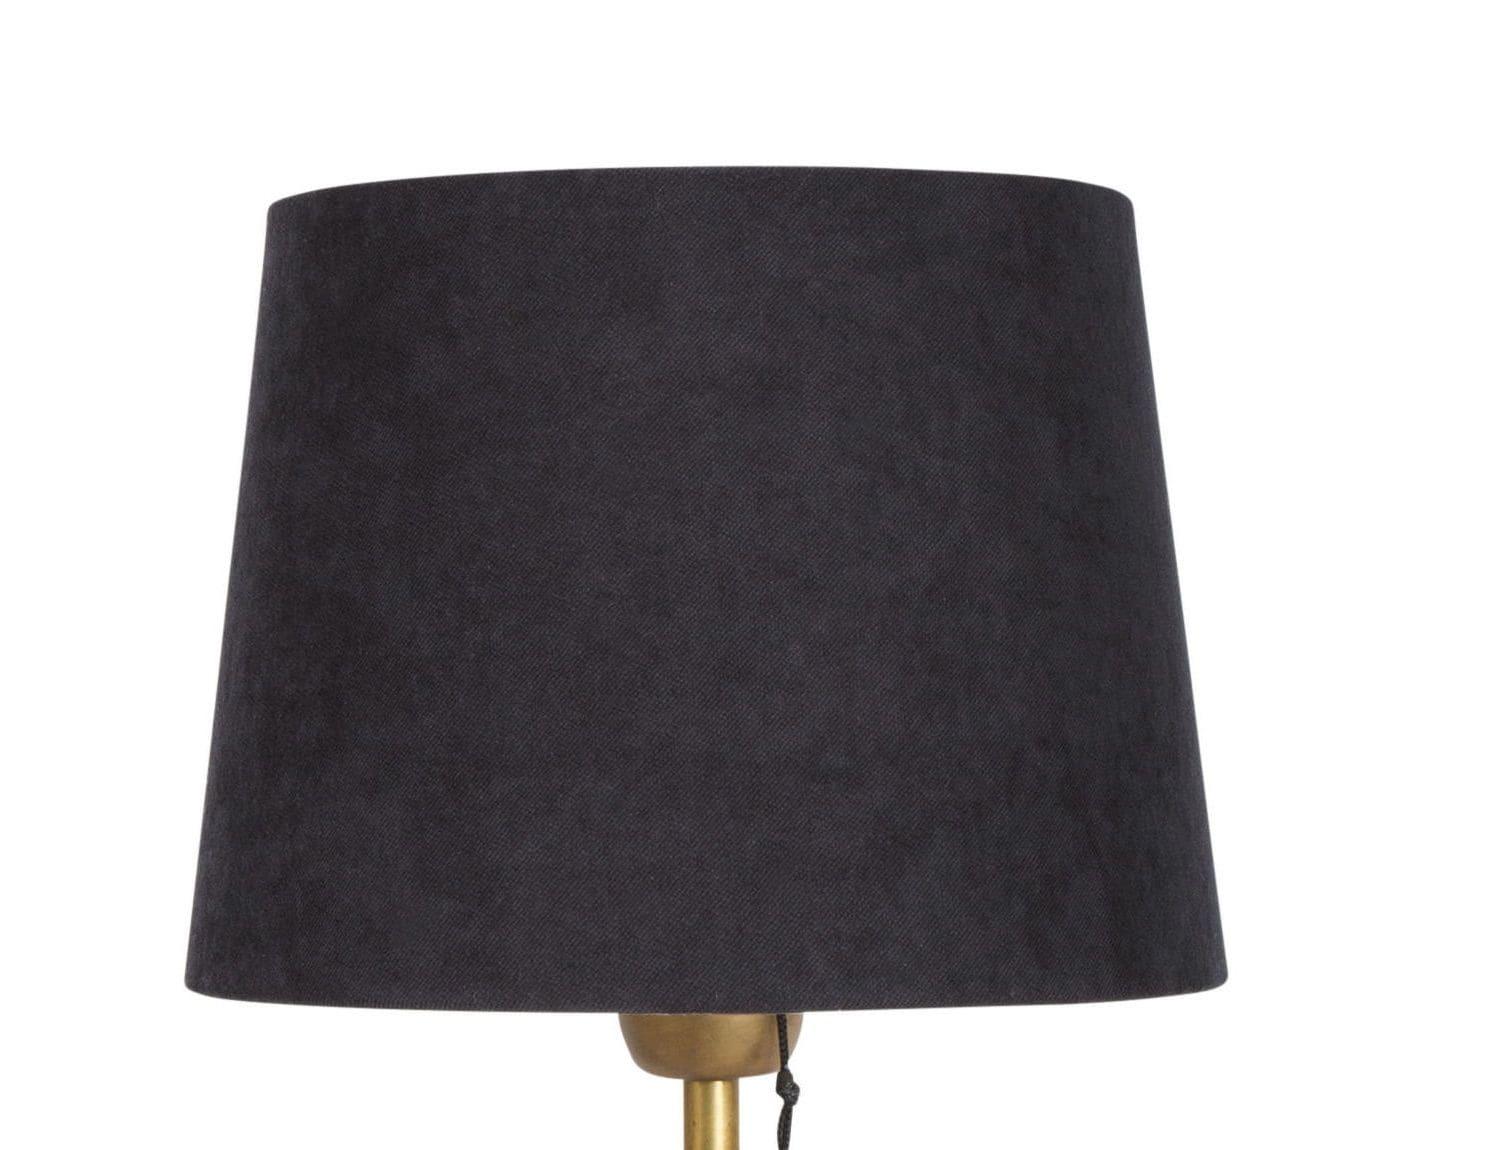 Viken 32 lampskärm svart sammet